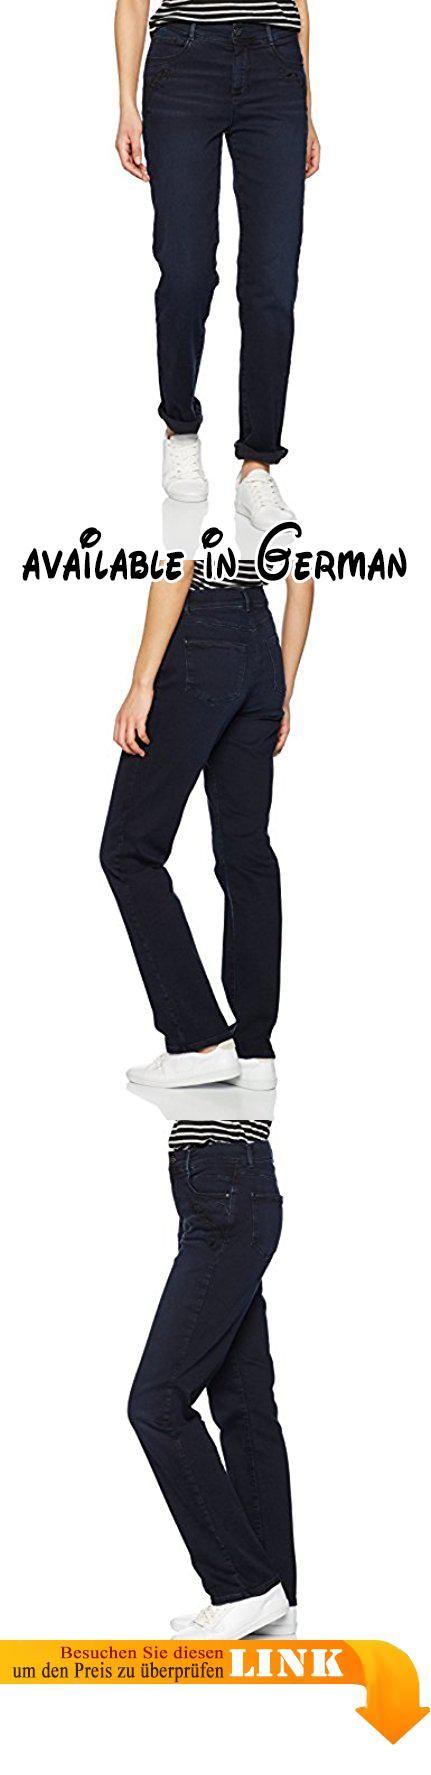 Bonita Damen Jeans Uni, Straight Blau (Blue Denim Grey Cast 1068), 38.  #Apparel #PANTS